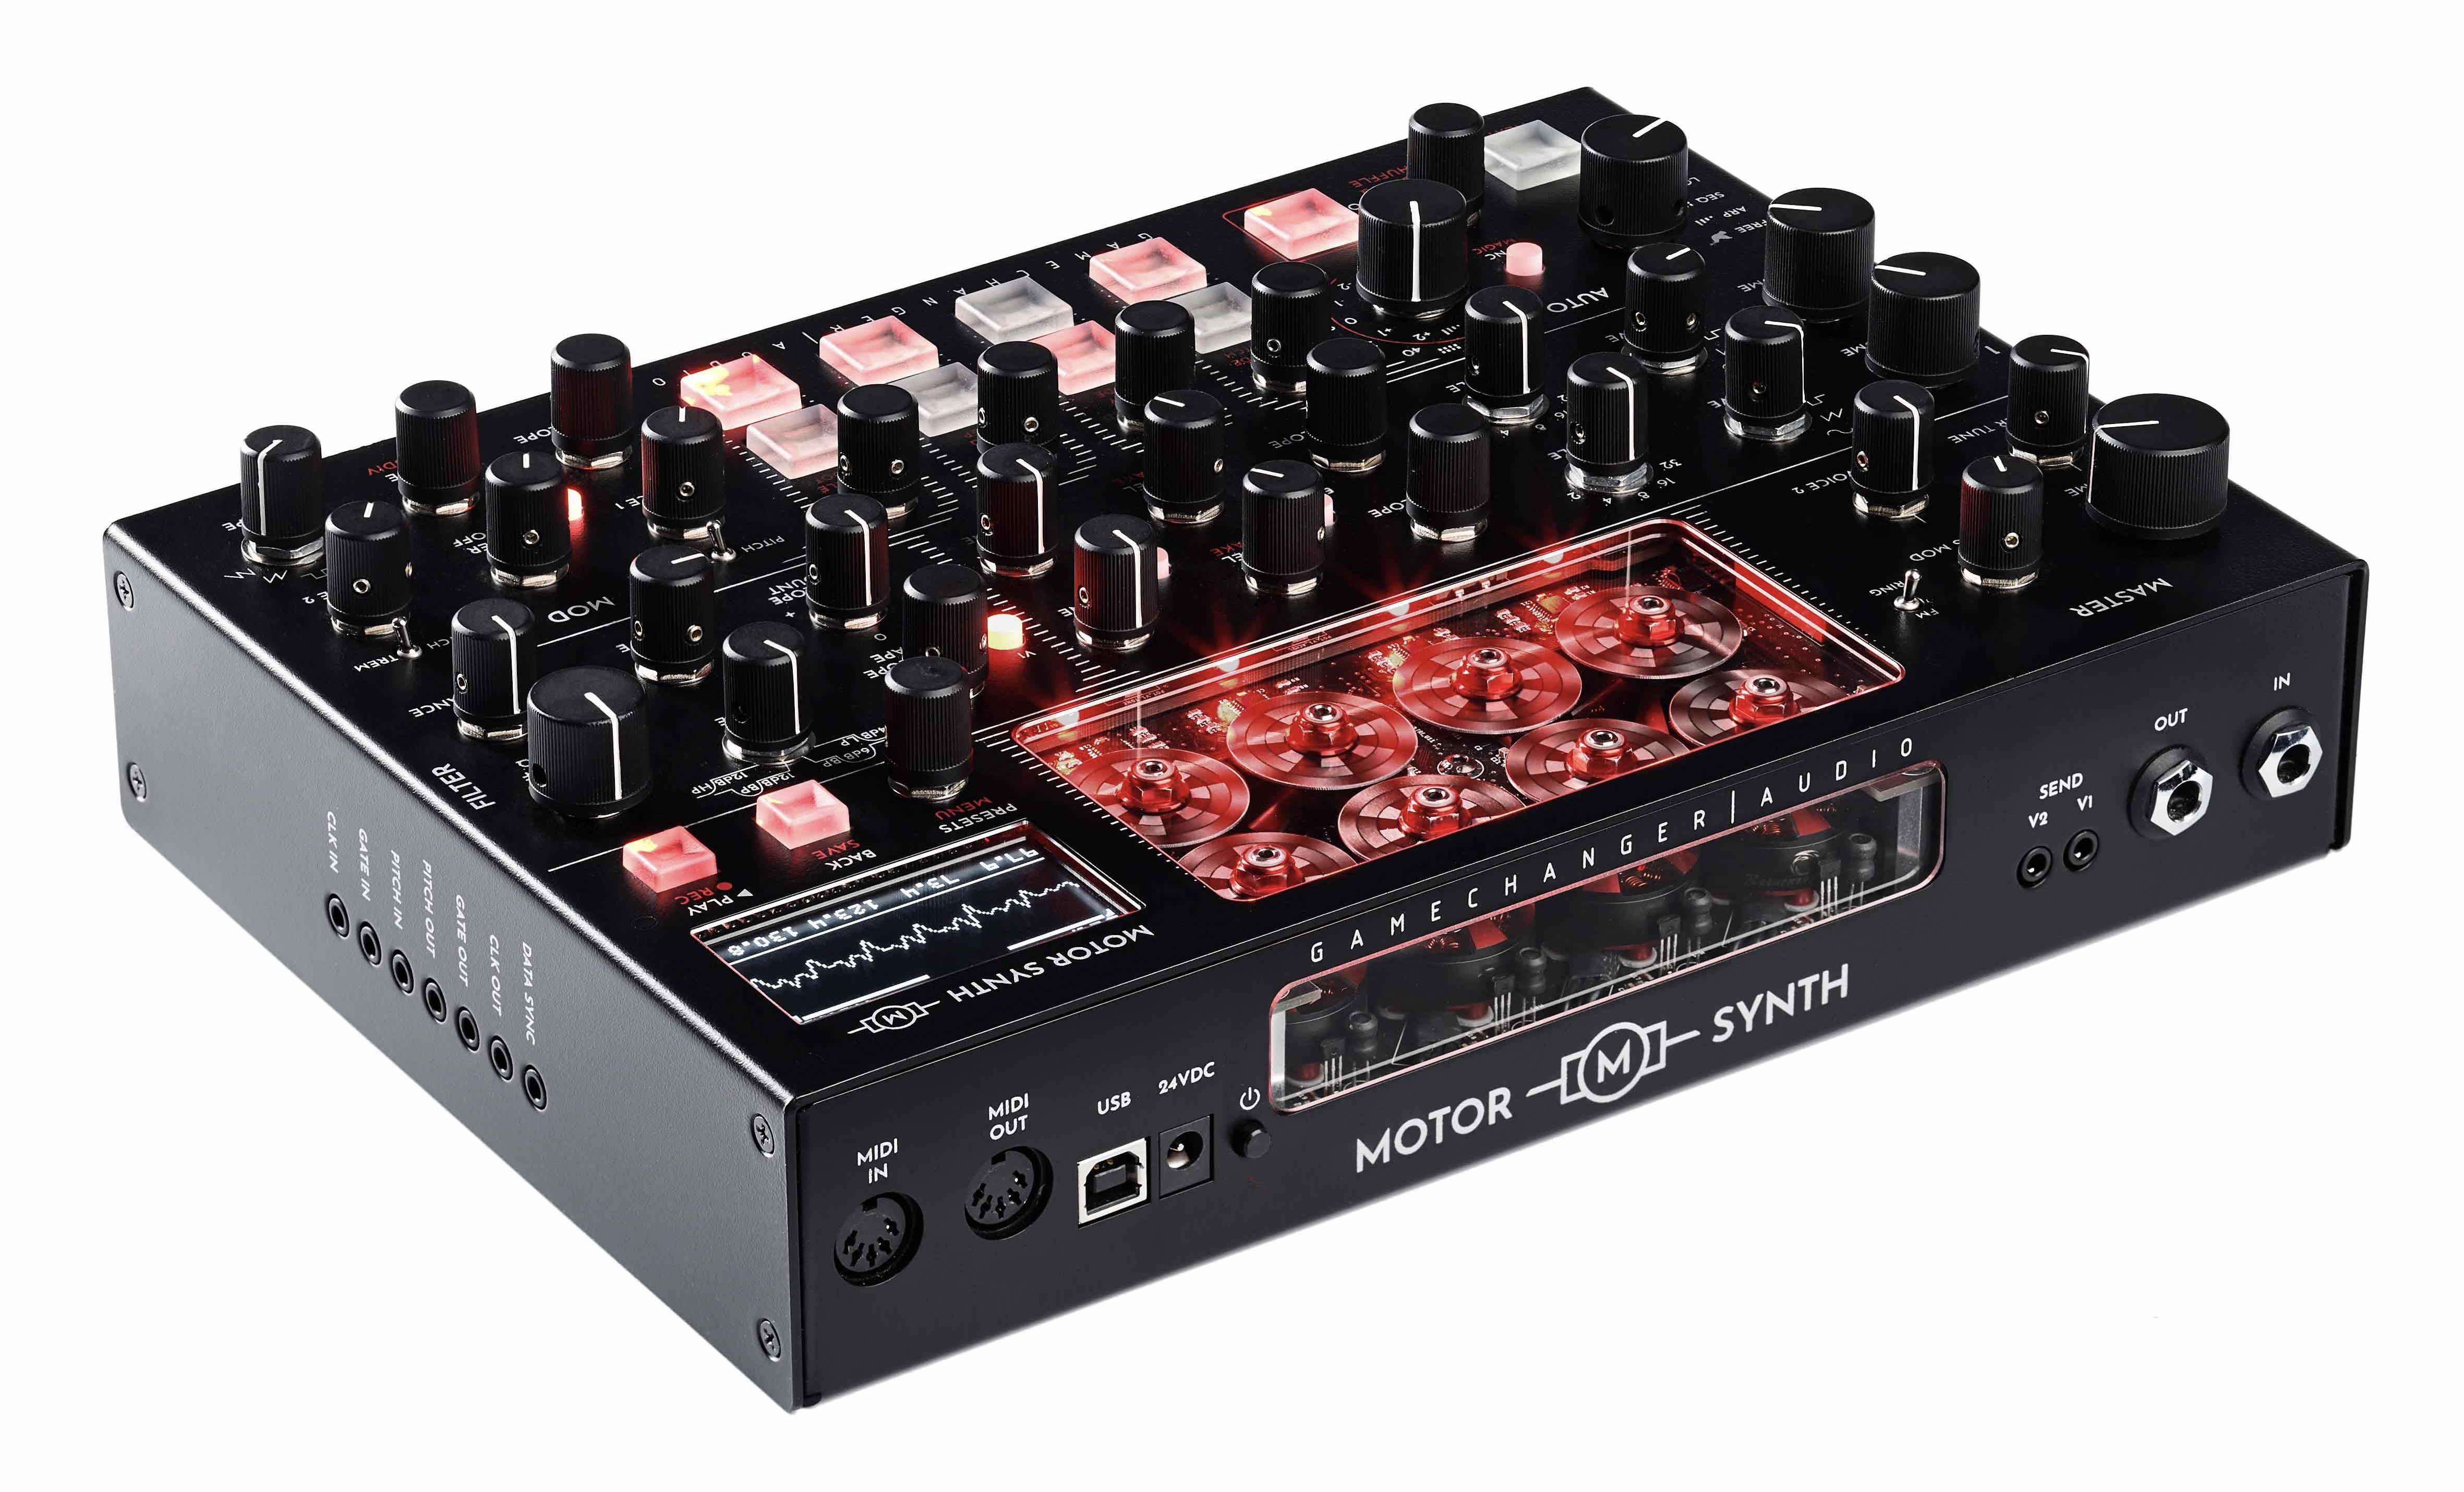 https://medias.audiofanzine.com/images/normal/gamechanger-audio-motor-synth-3017008.jpeg